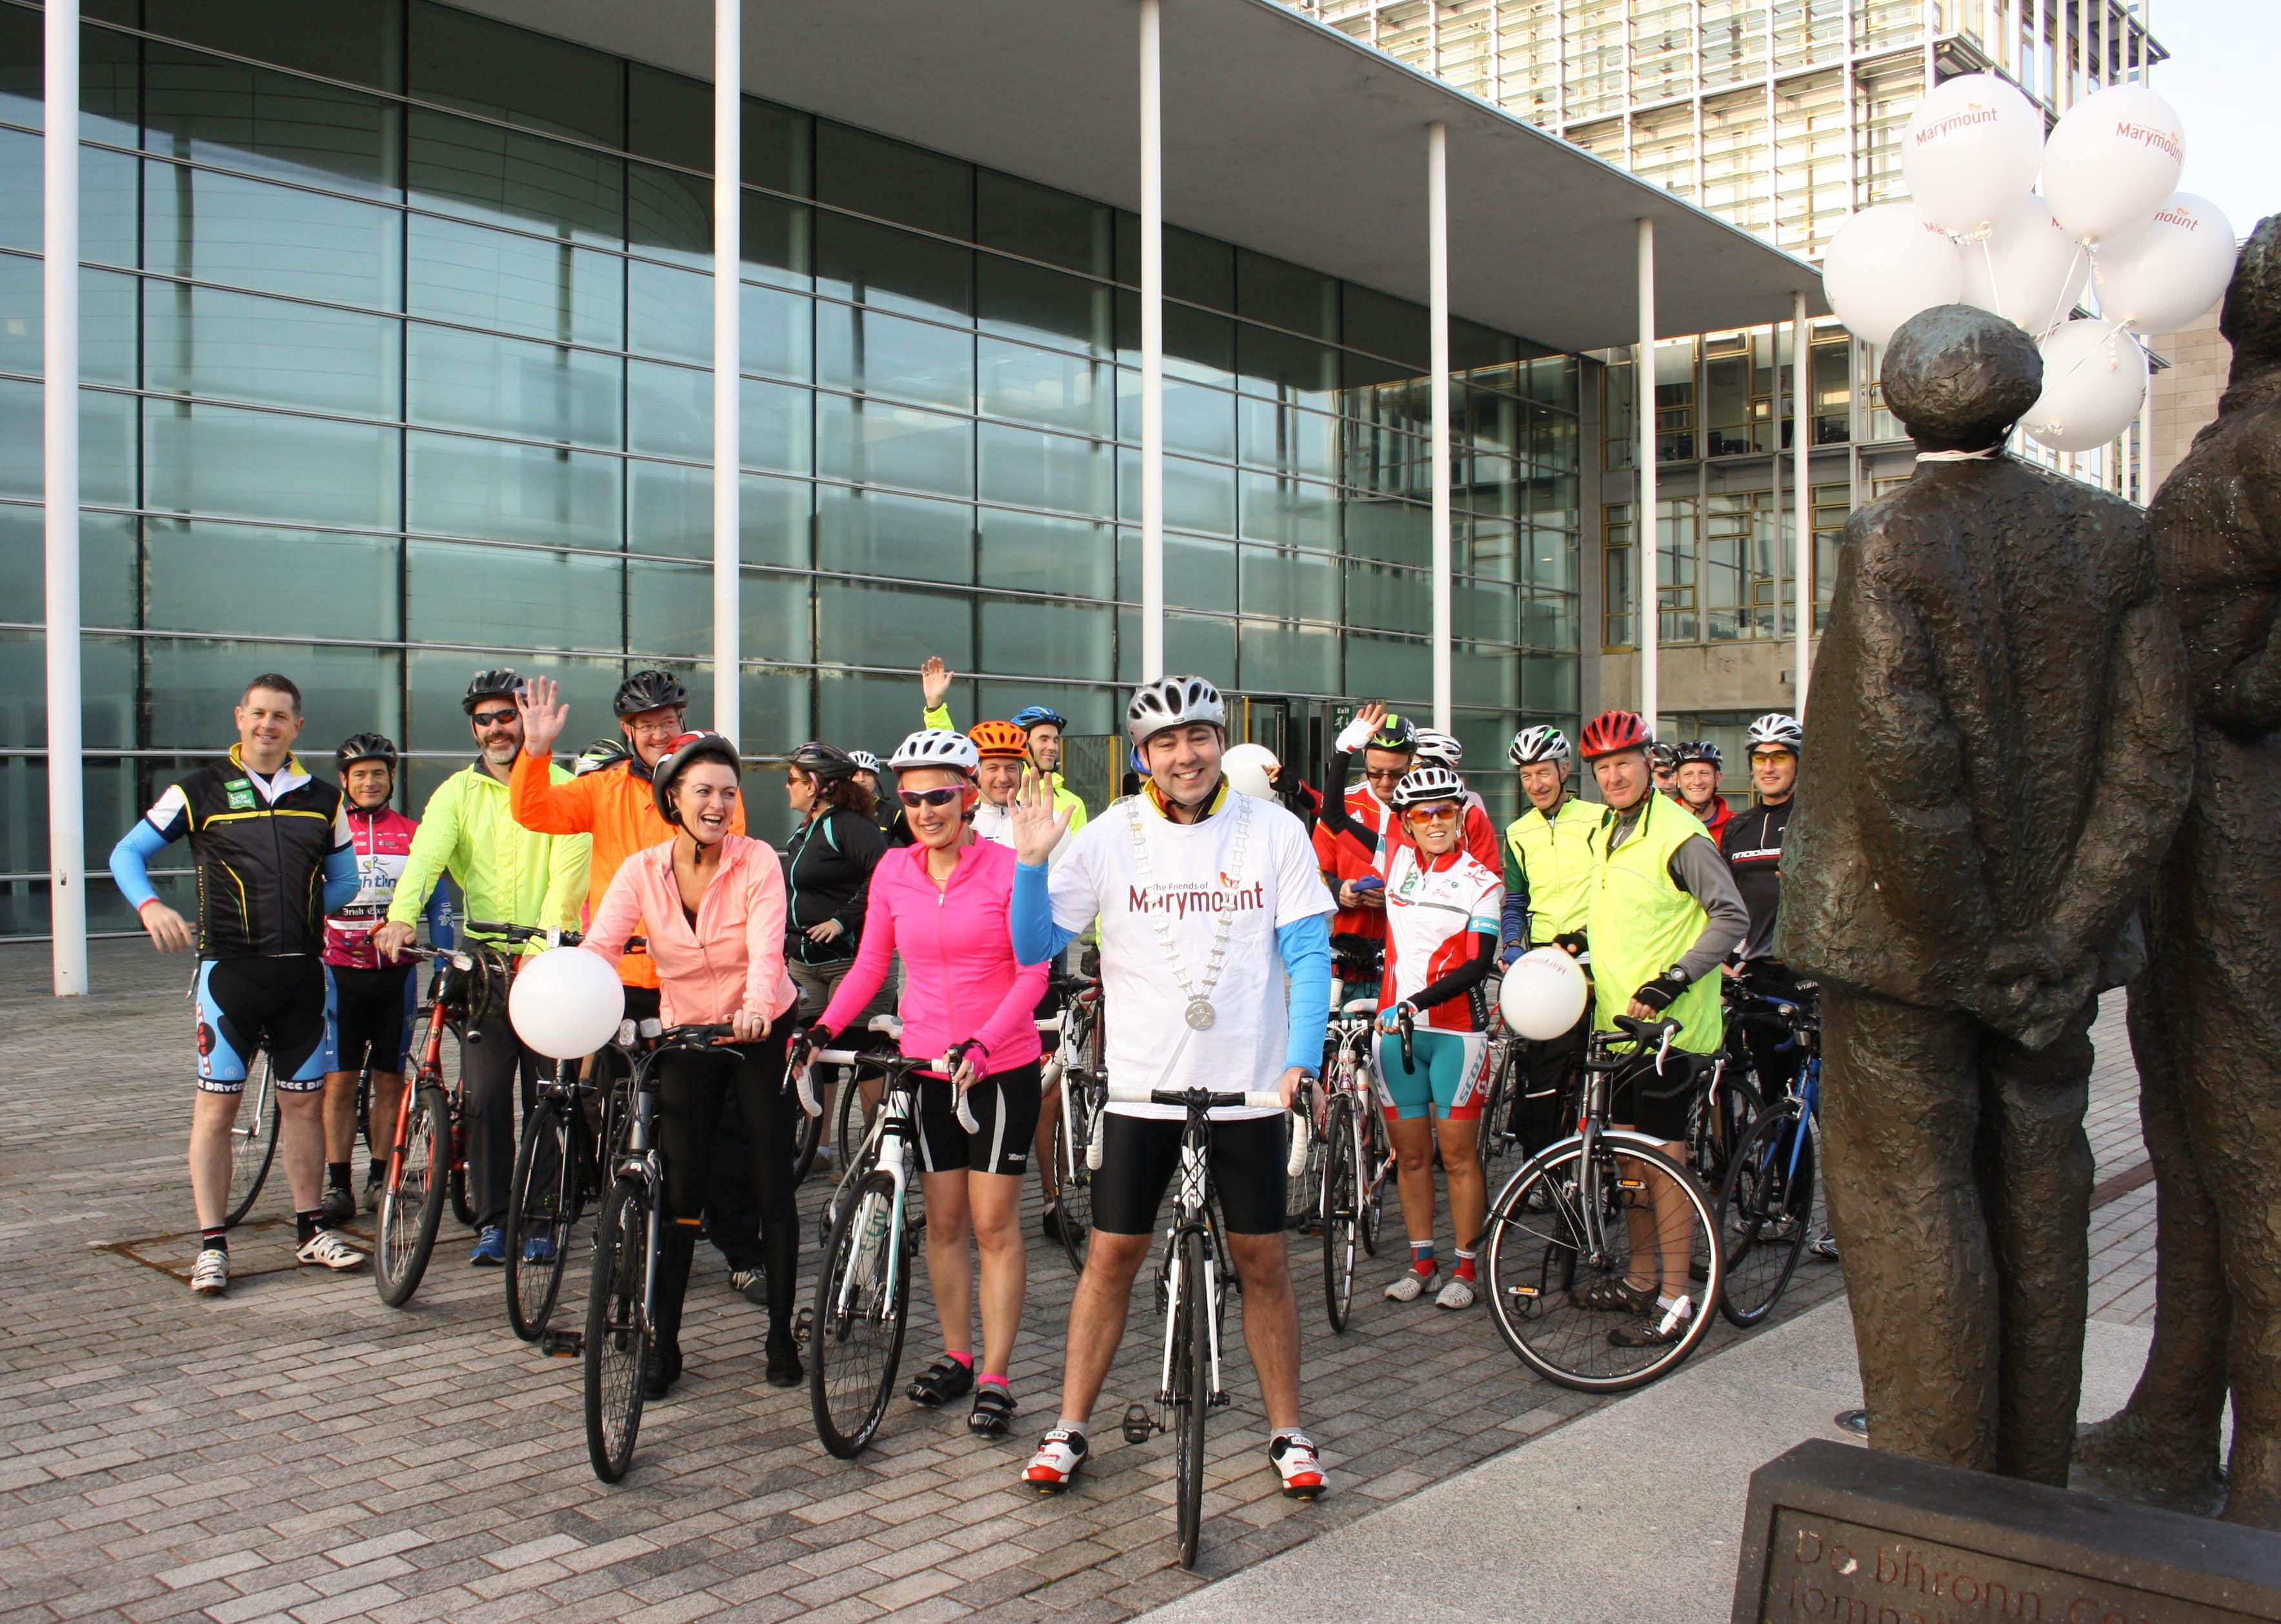 Cork County Council Big Bike Ride 2015 Raises €2,616 For Charity